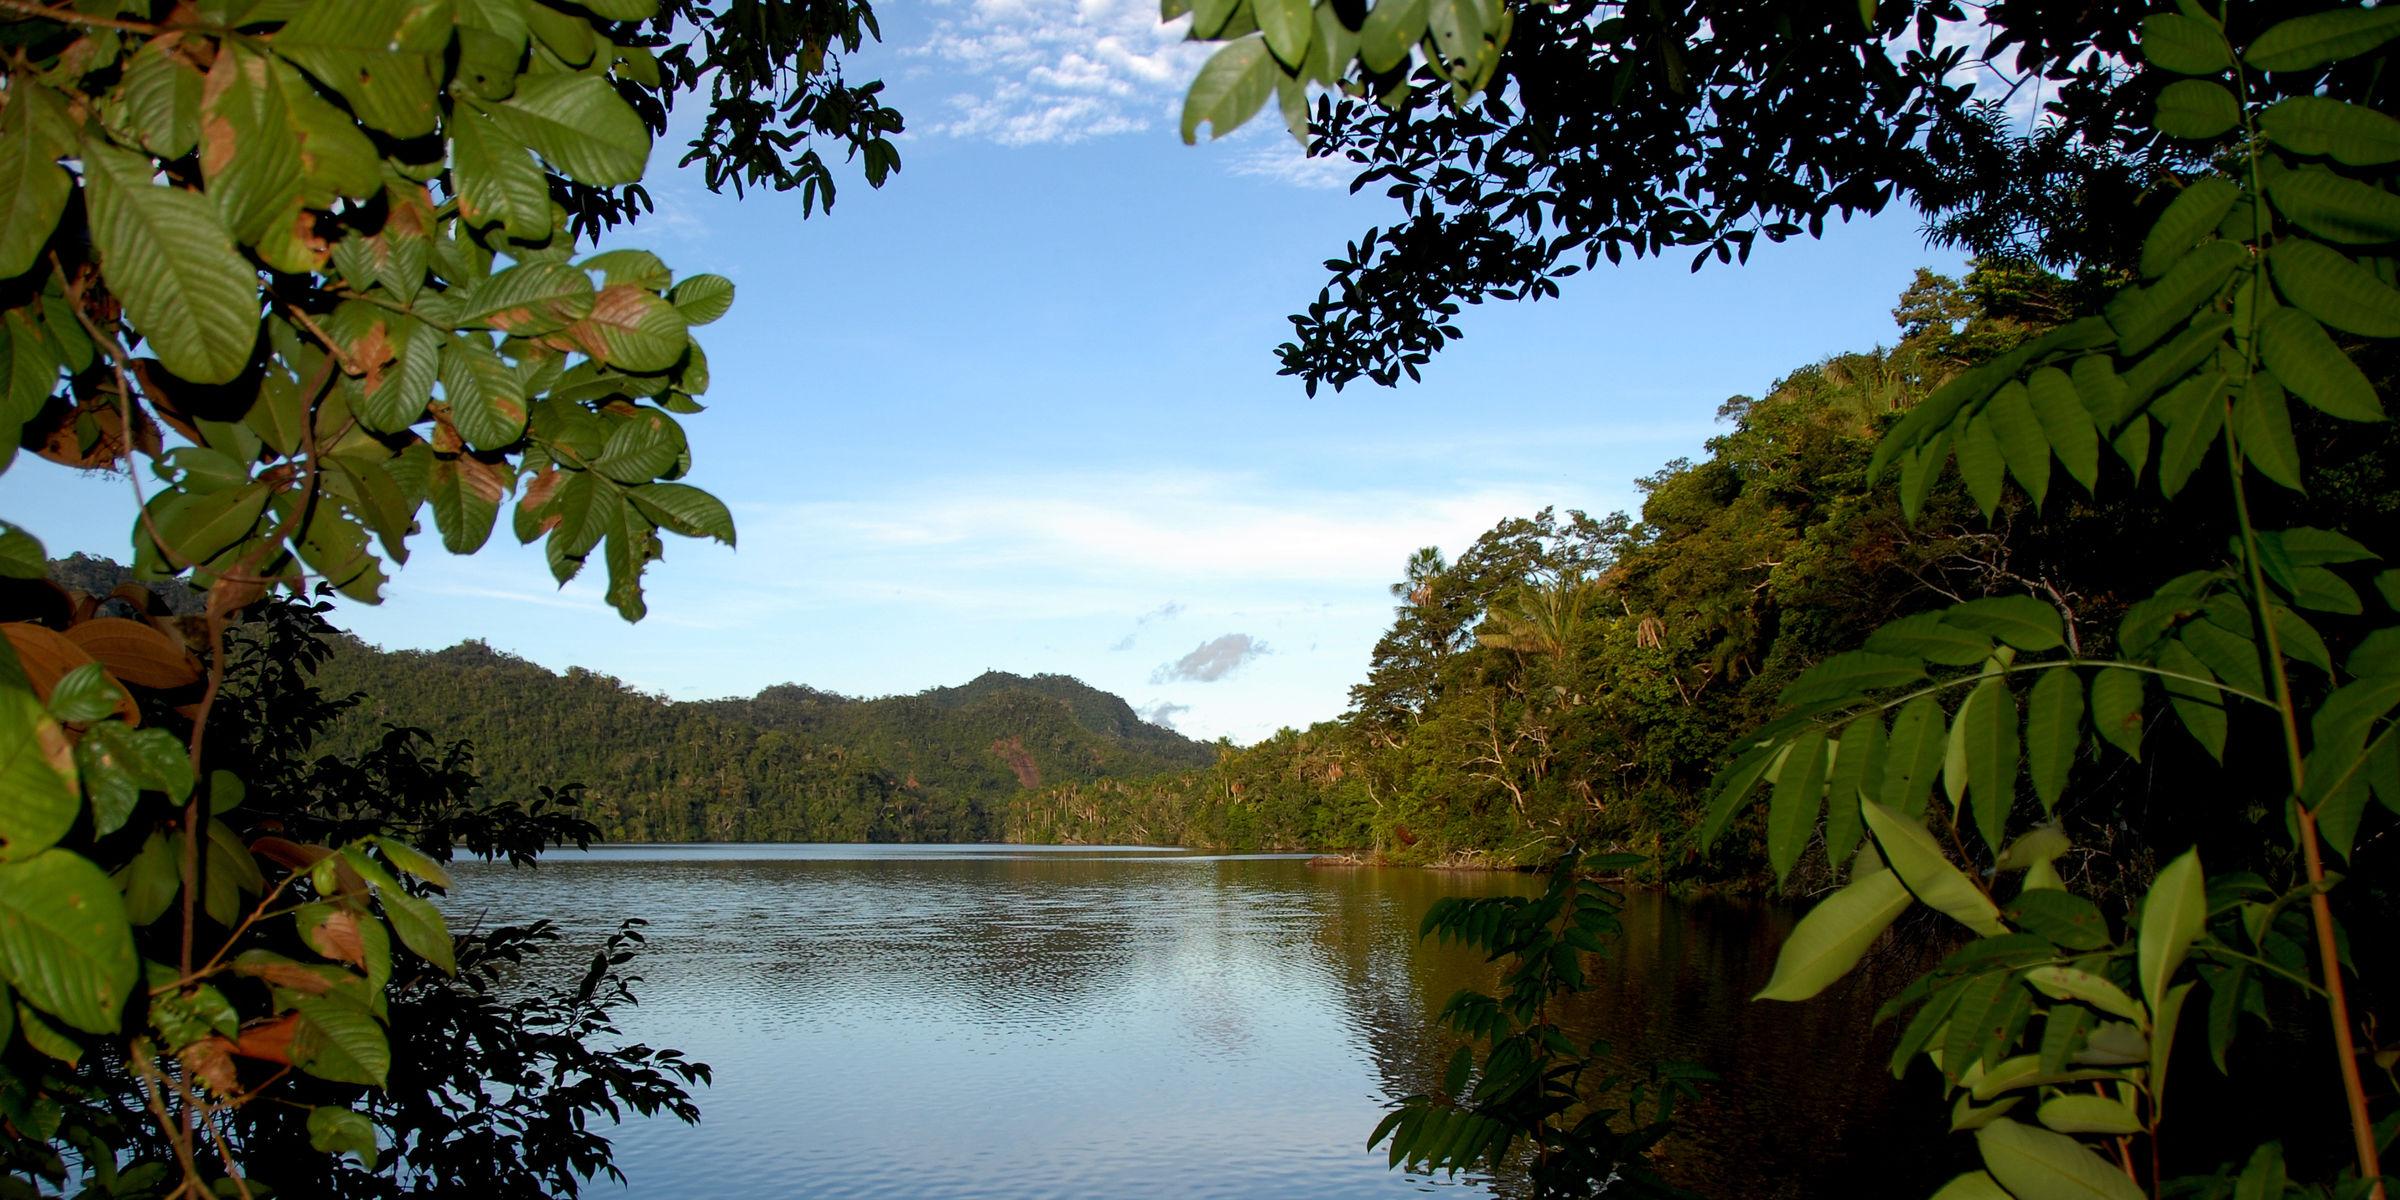 ConservationEfforts_Mundo Perdido Lake 5 ADC